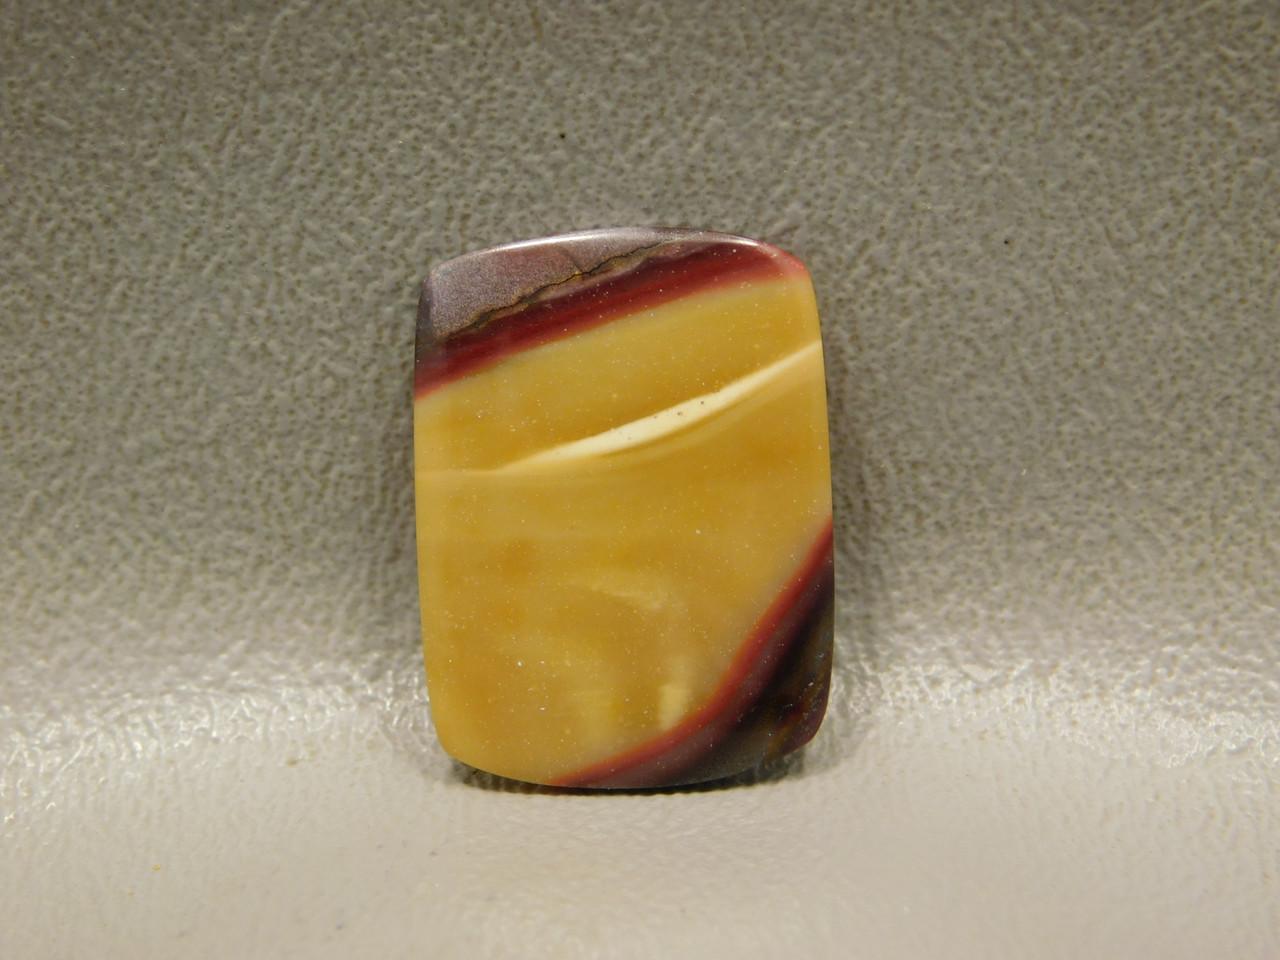 Mookaite Jasper Mookite Cabochon for Jewelry Making #13